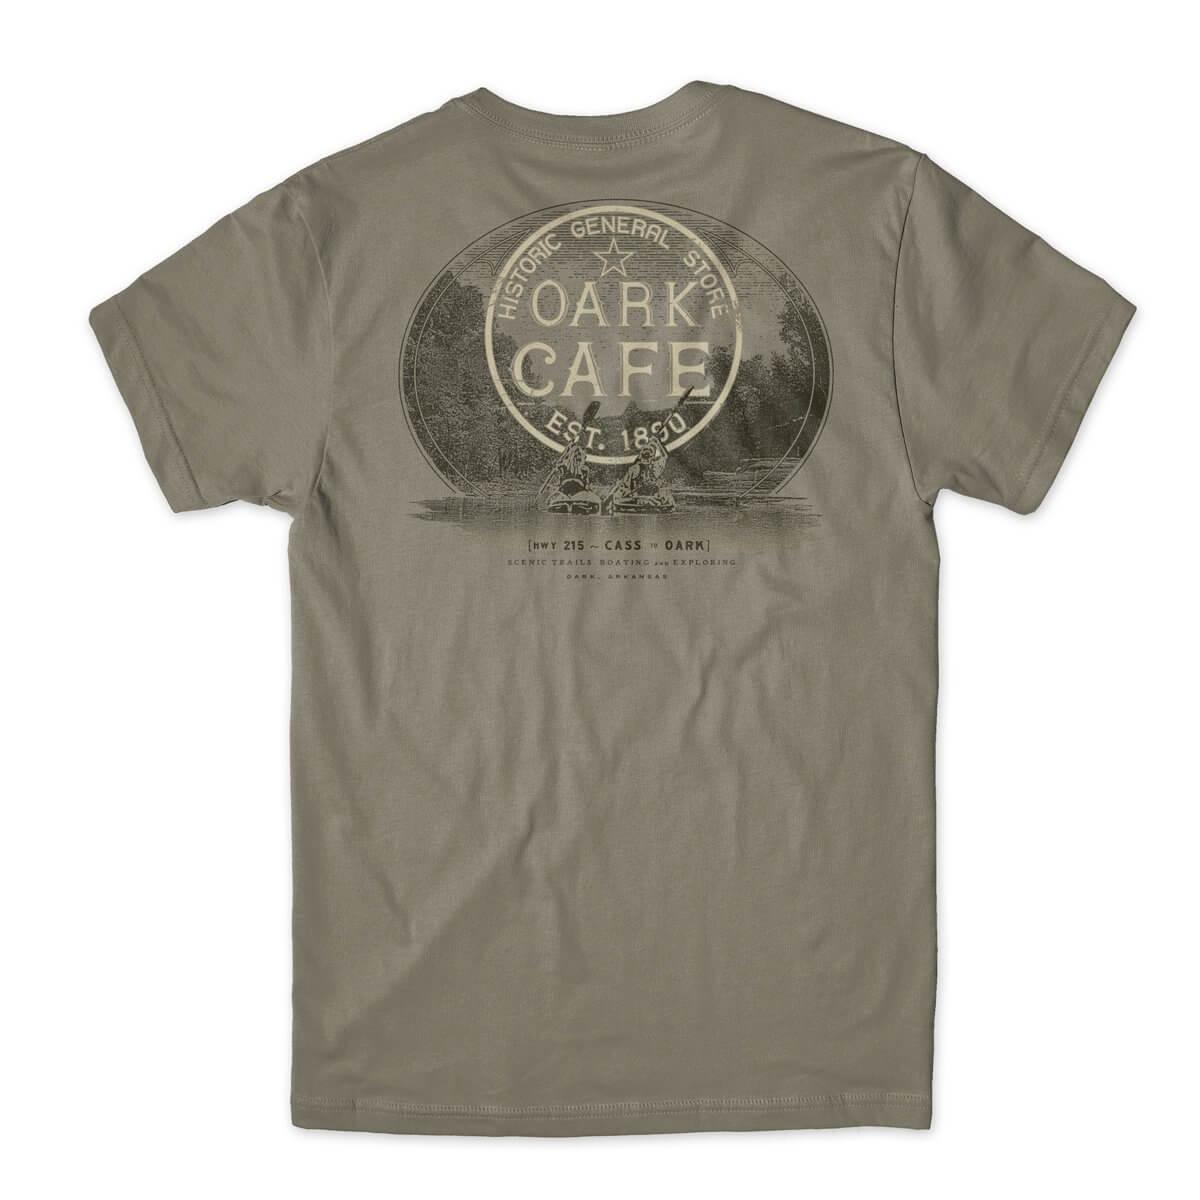 Oark Cafe kayak t-shirt design